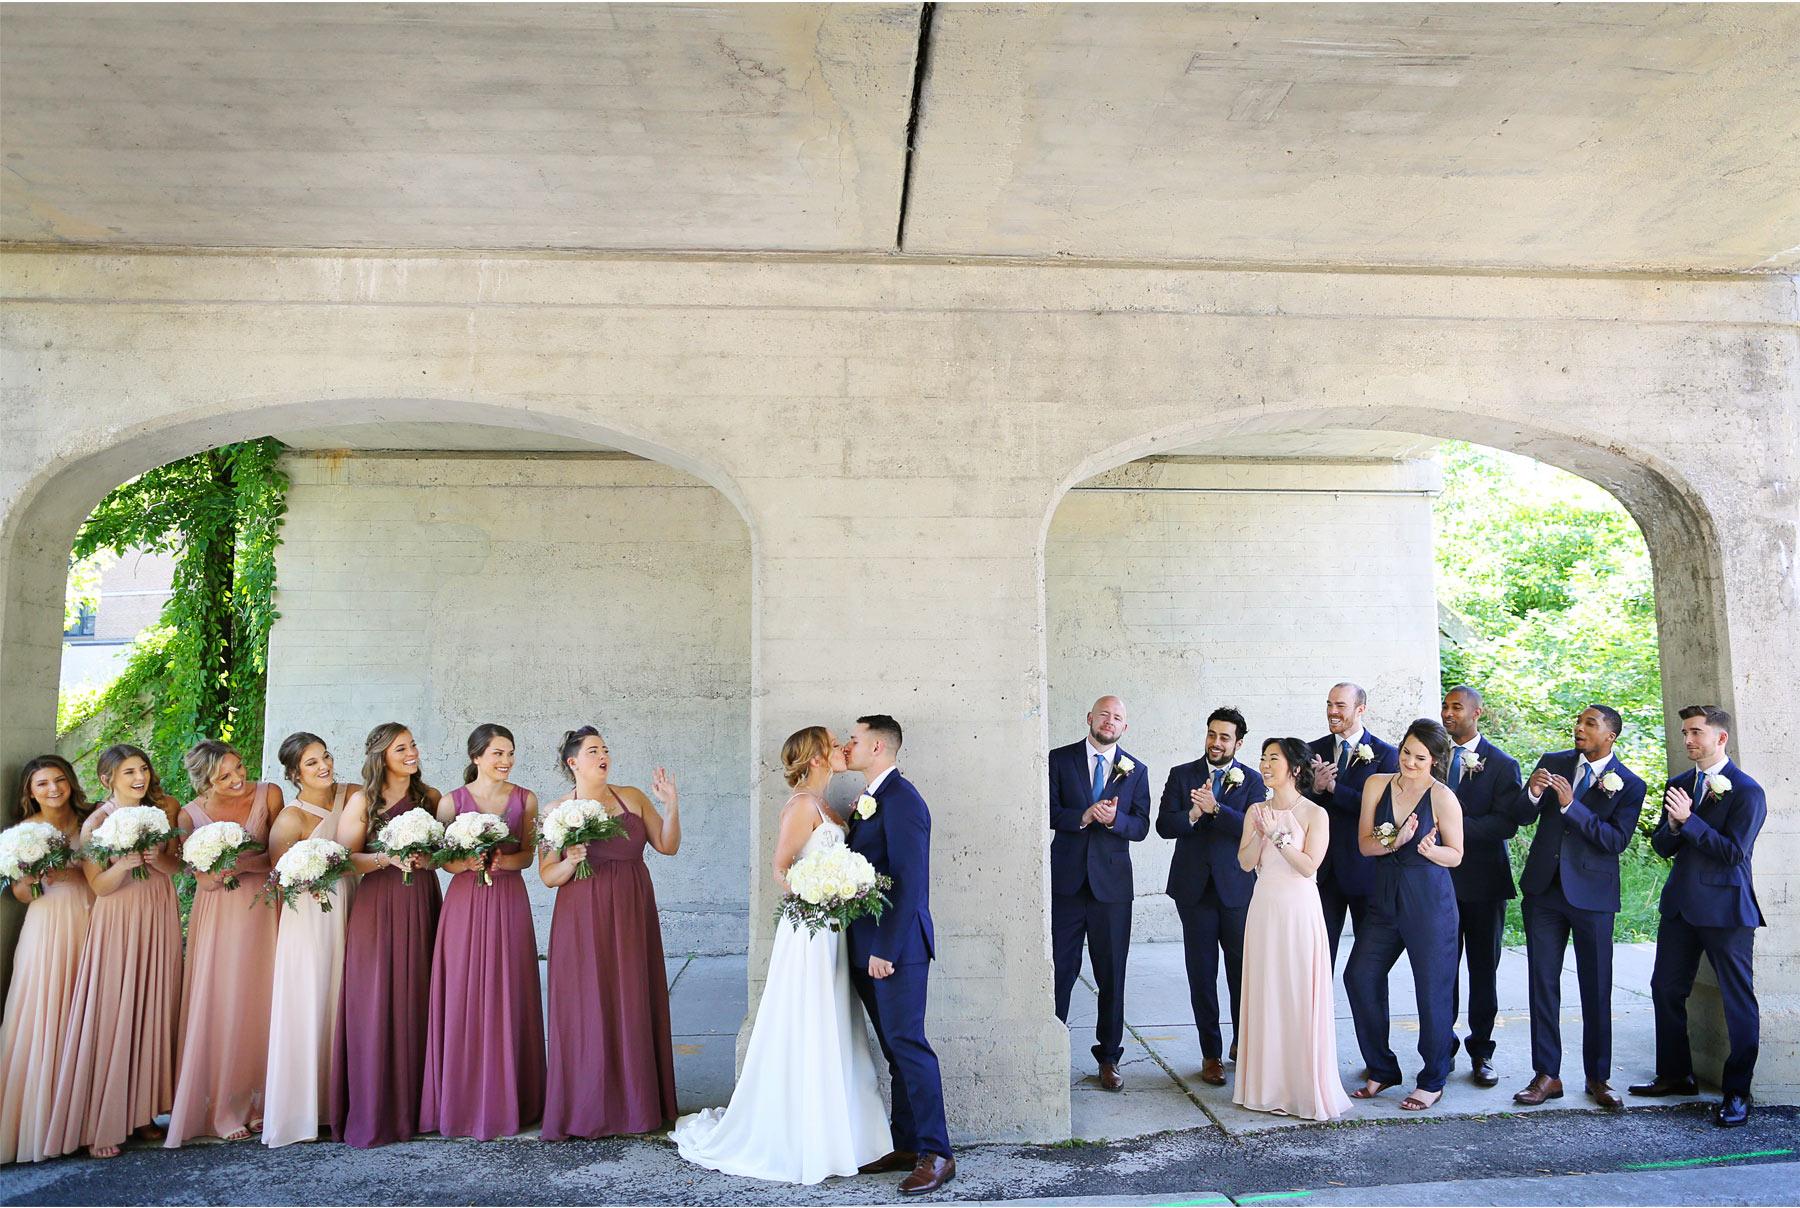 10-Minneapolis-Minnesota-Wedding-Andrew-Vick-Photography-Calhoun-Beach-Club-Groom-Bride-Outside-Summer-Wedding-Party-Samantha-and-Ryan.jpg